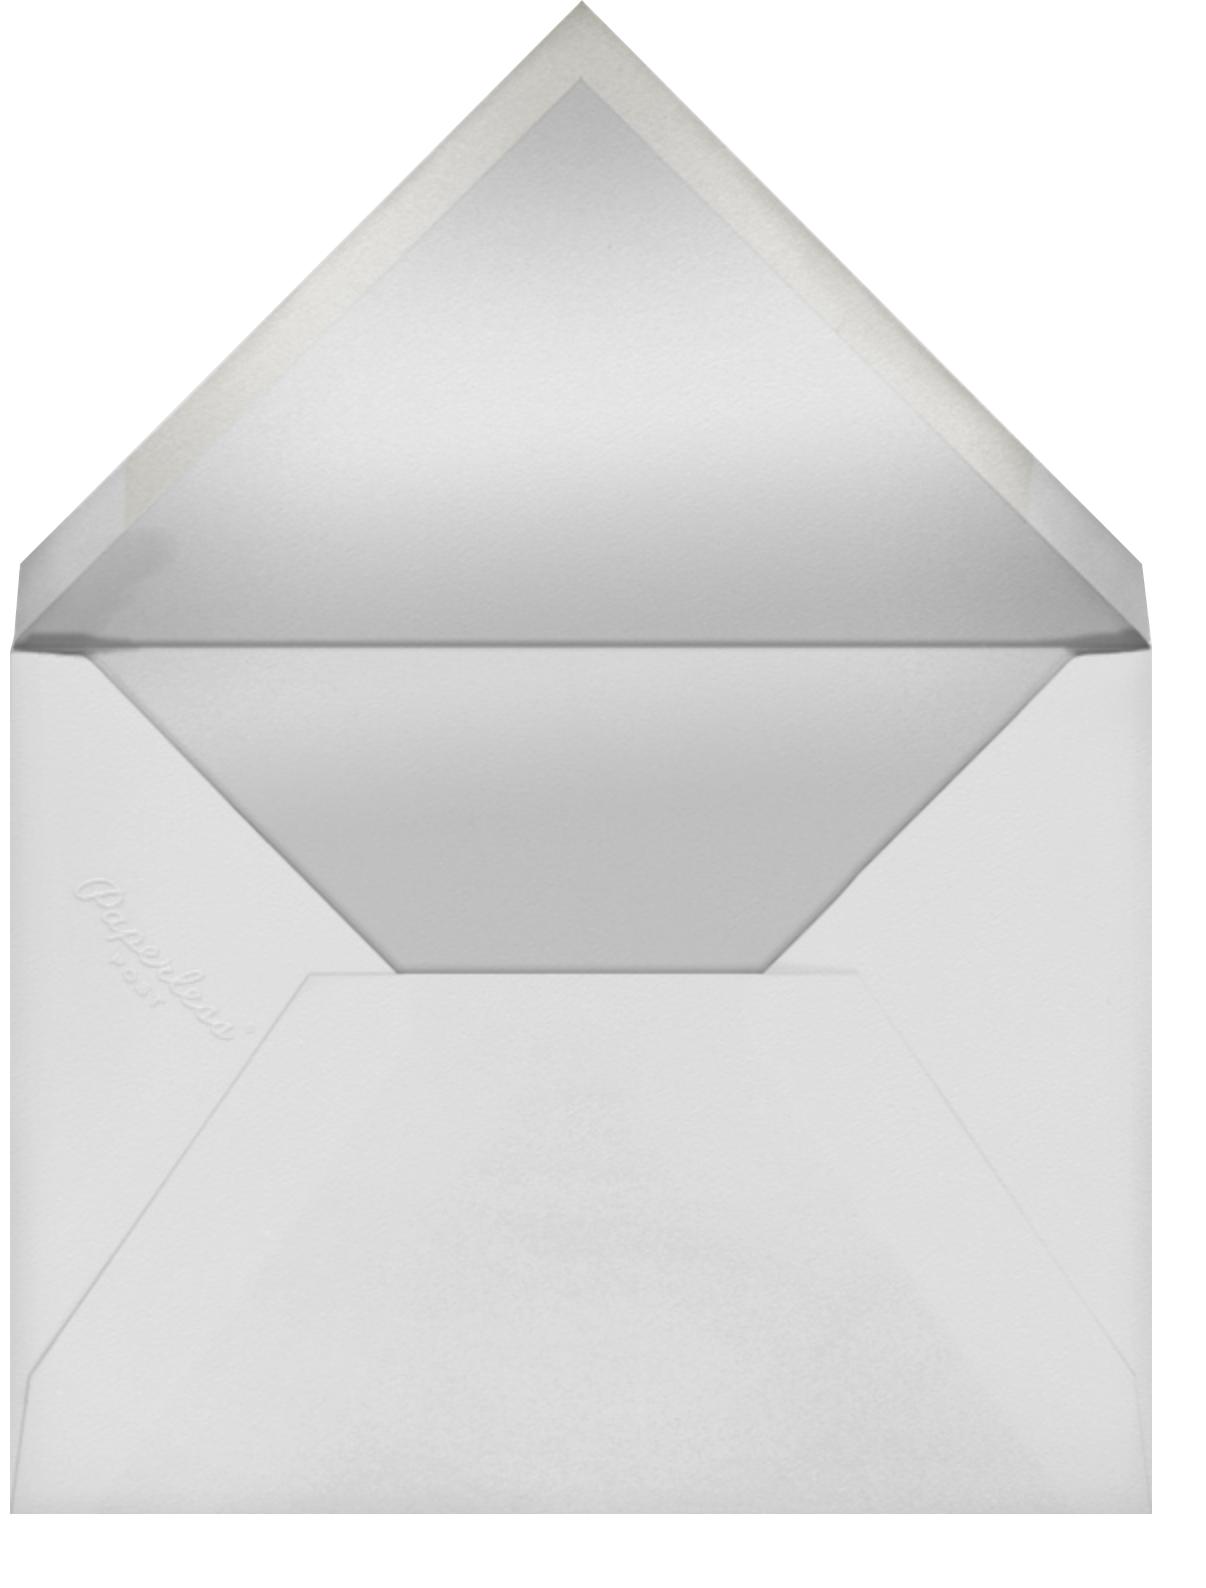 Floral Silhouette (Menu) - White/Silver - Rifle Paper Co. - Menus - envelope back